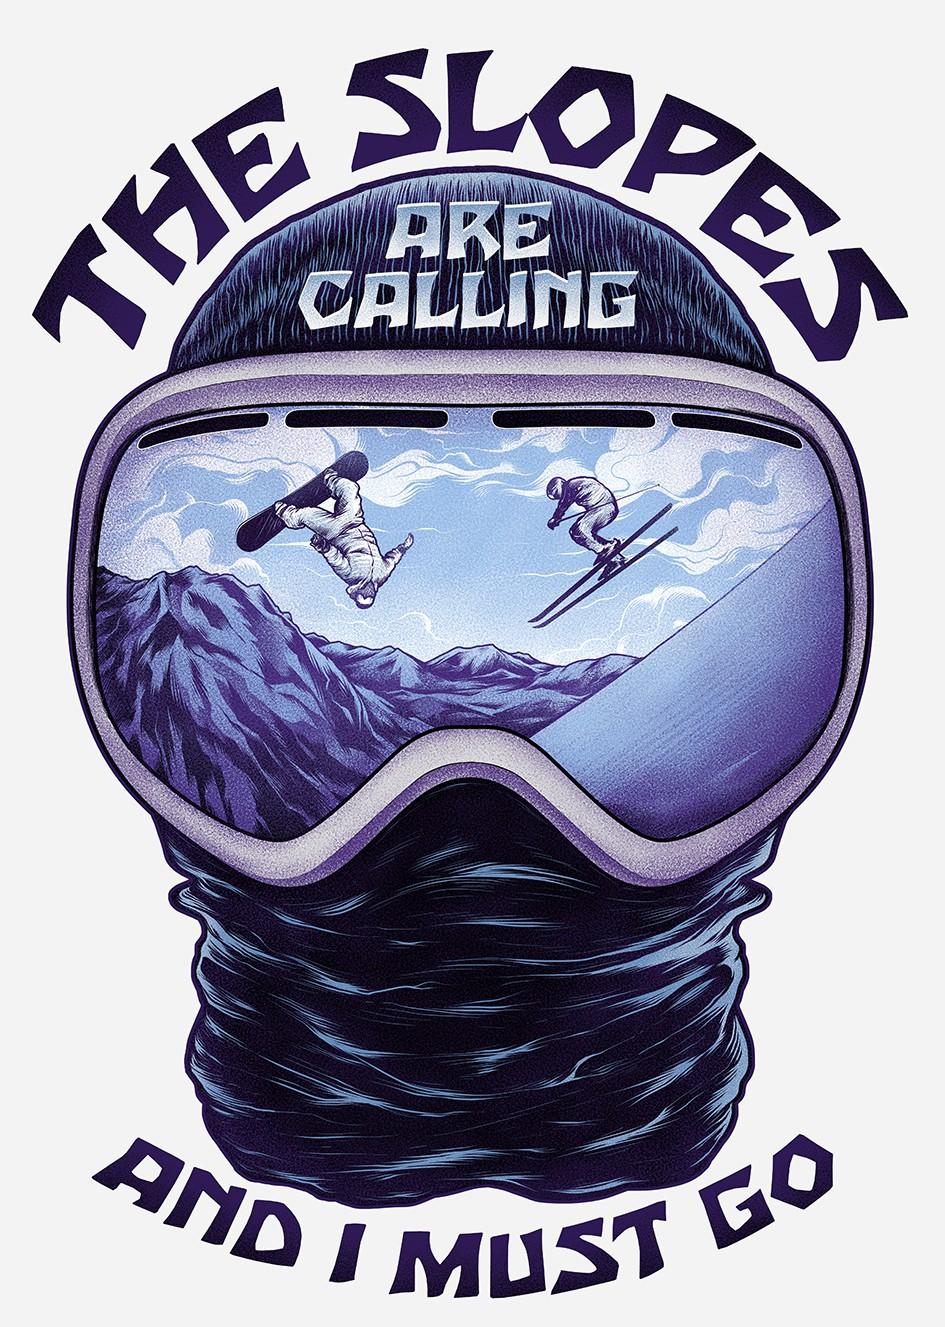 The Slopes Are Calling .... Ski Shirt